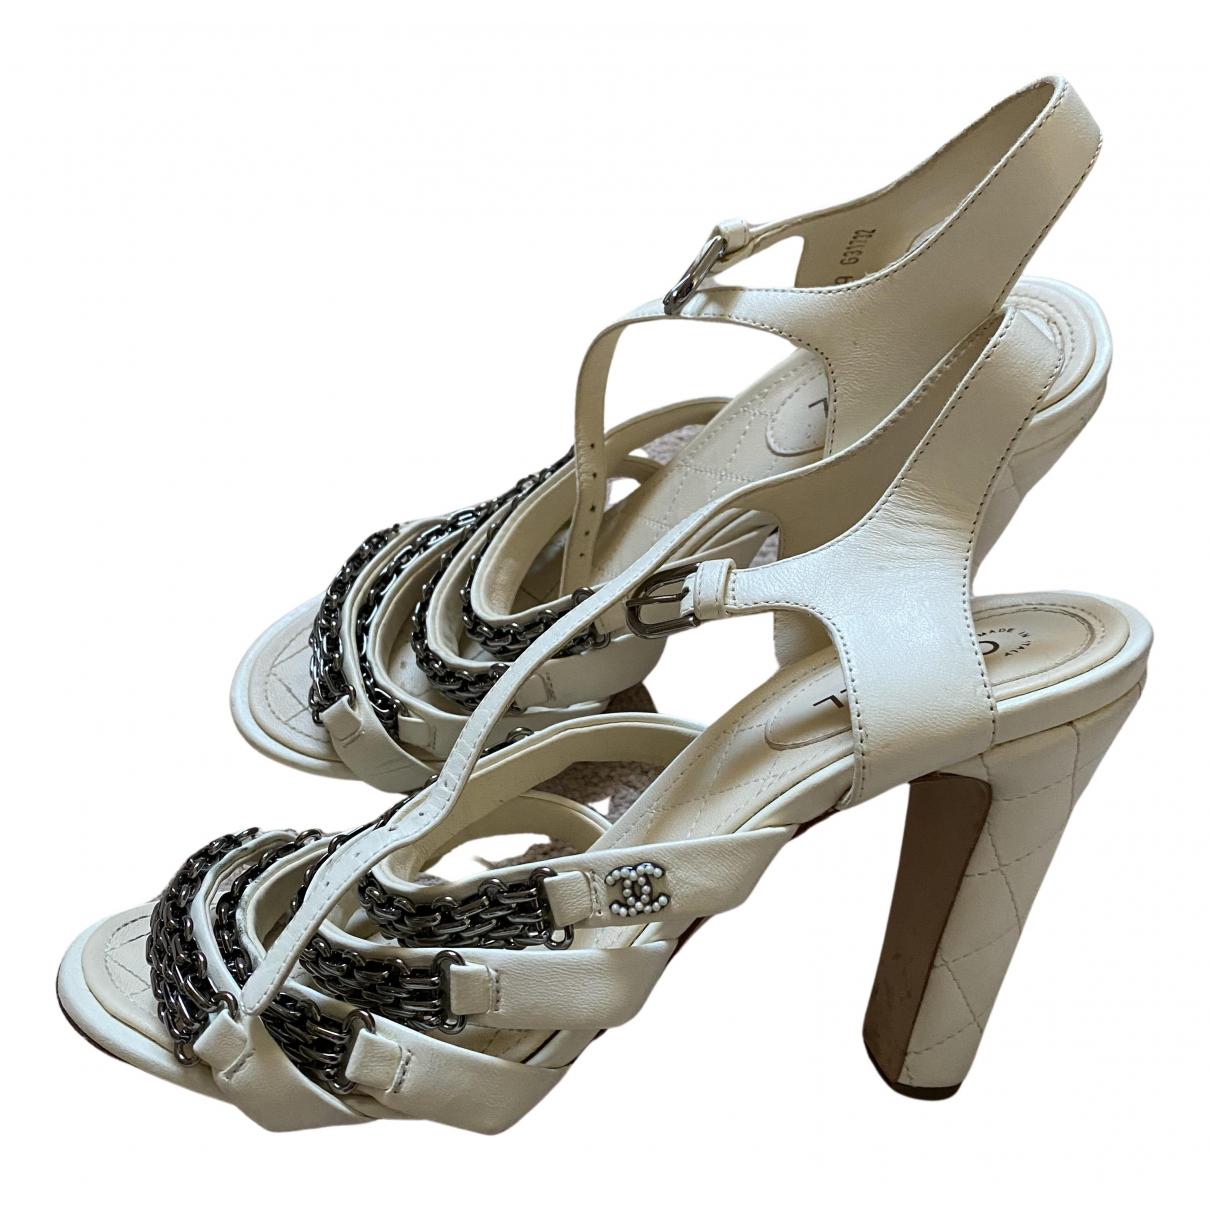 Chanel N Ecru Leather Sandals for Women 39.5 EU